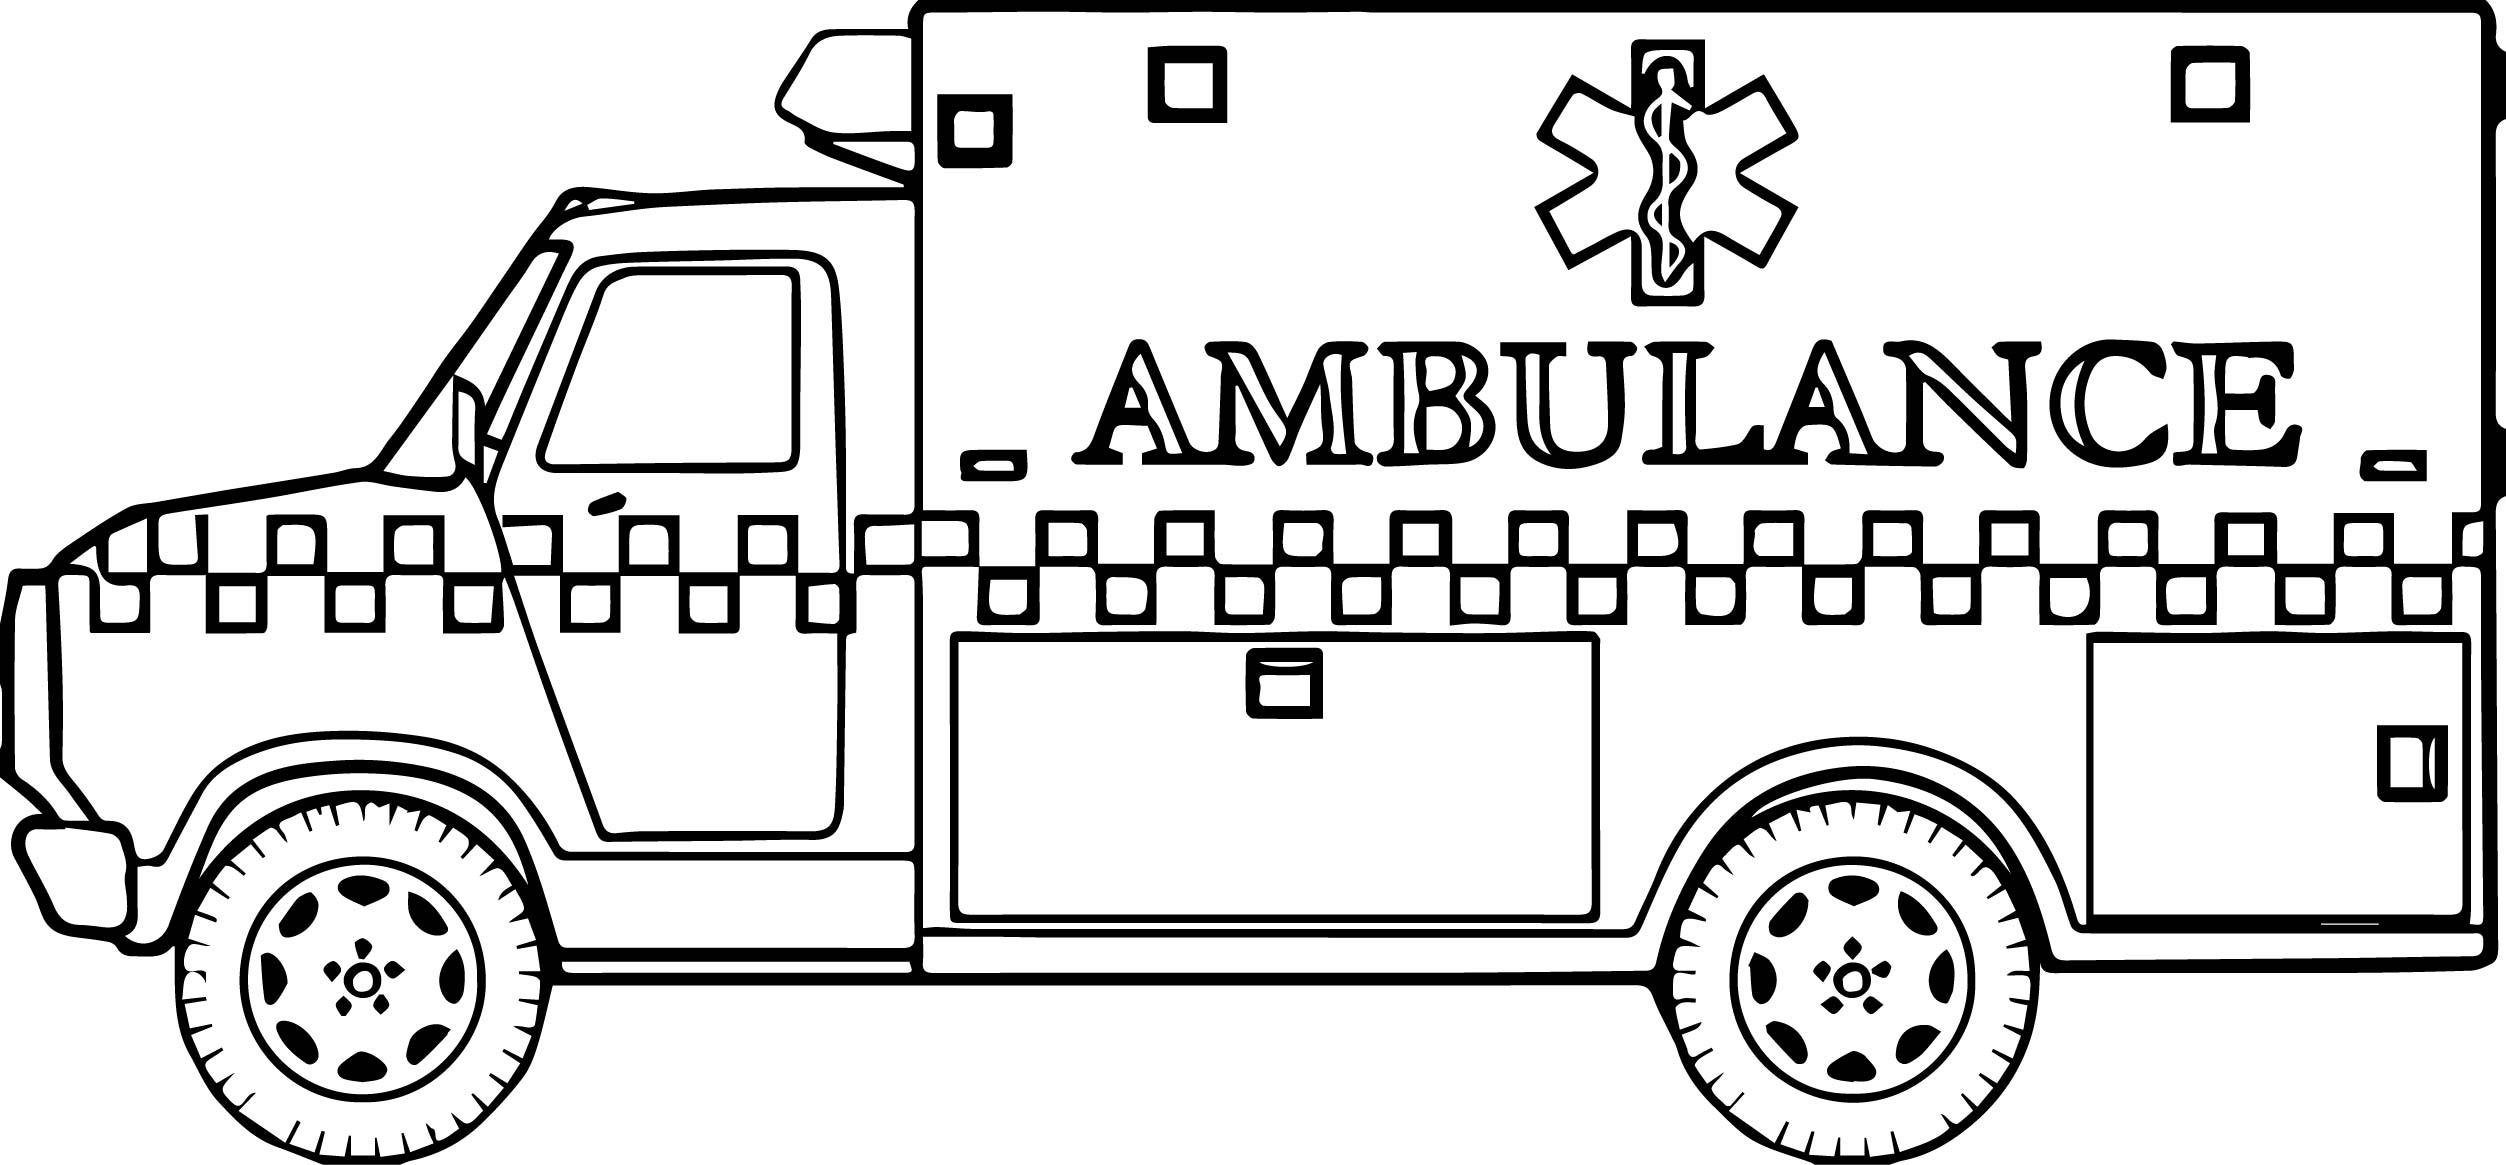 A Ambulance Coloring Page